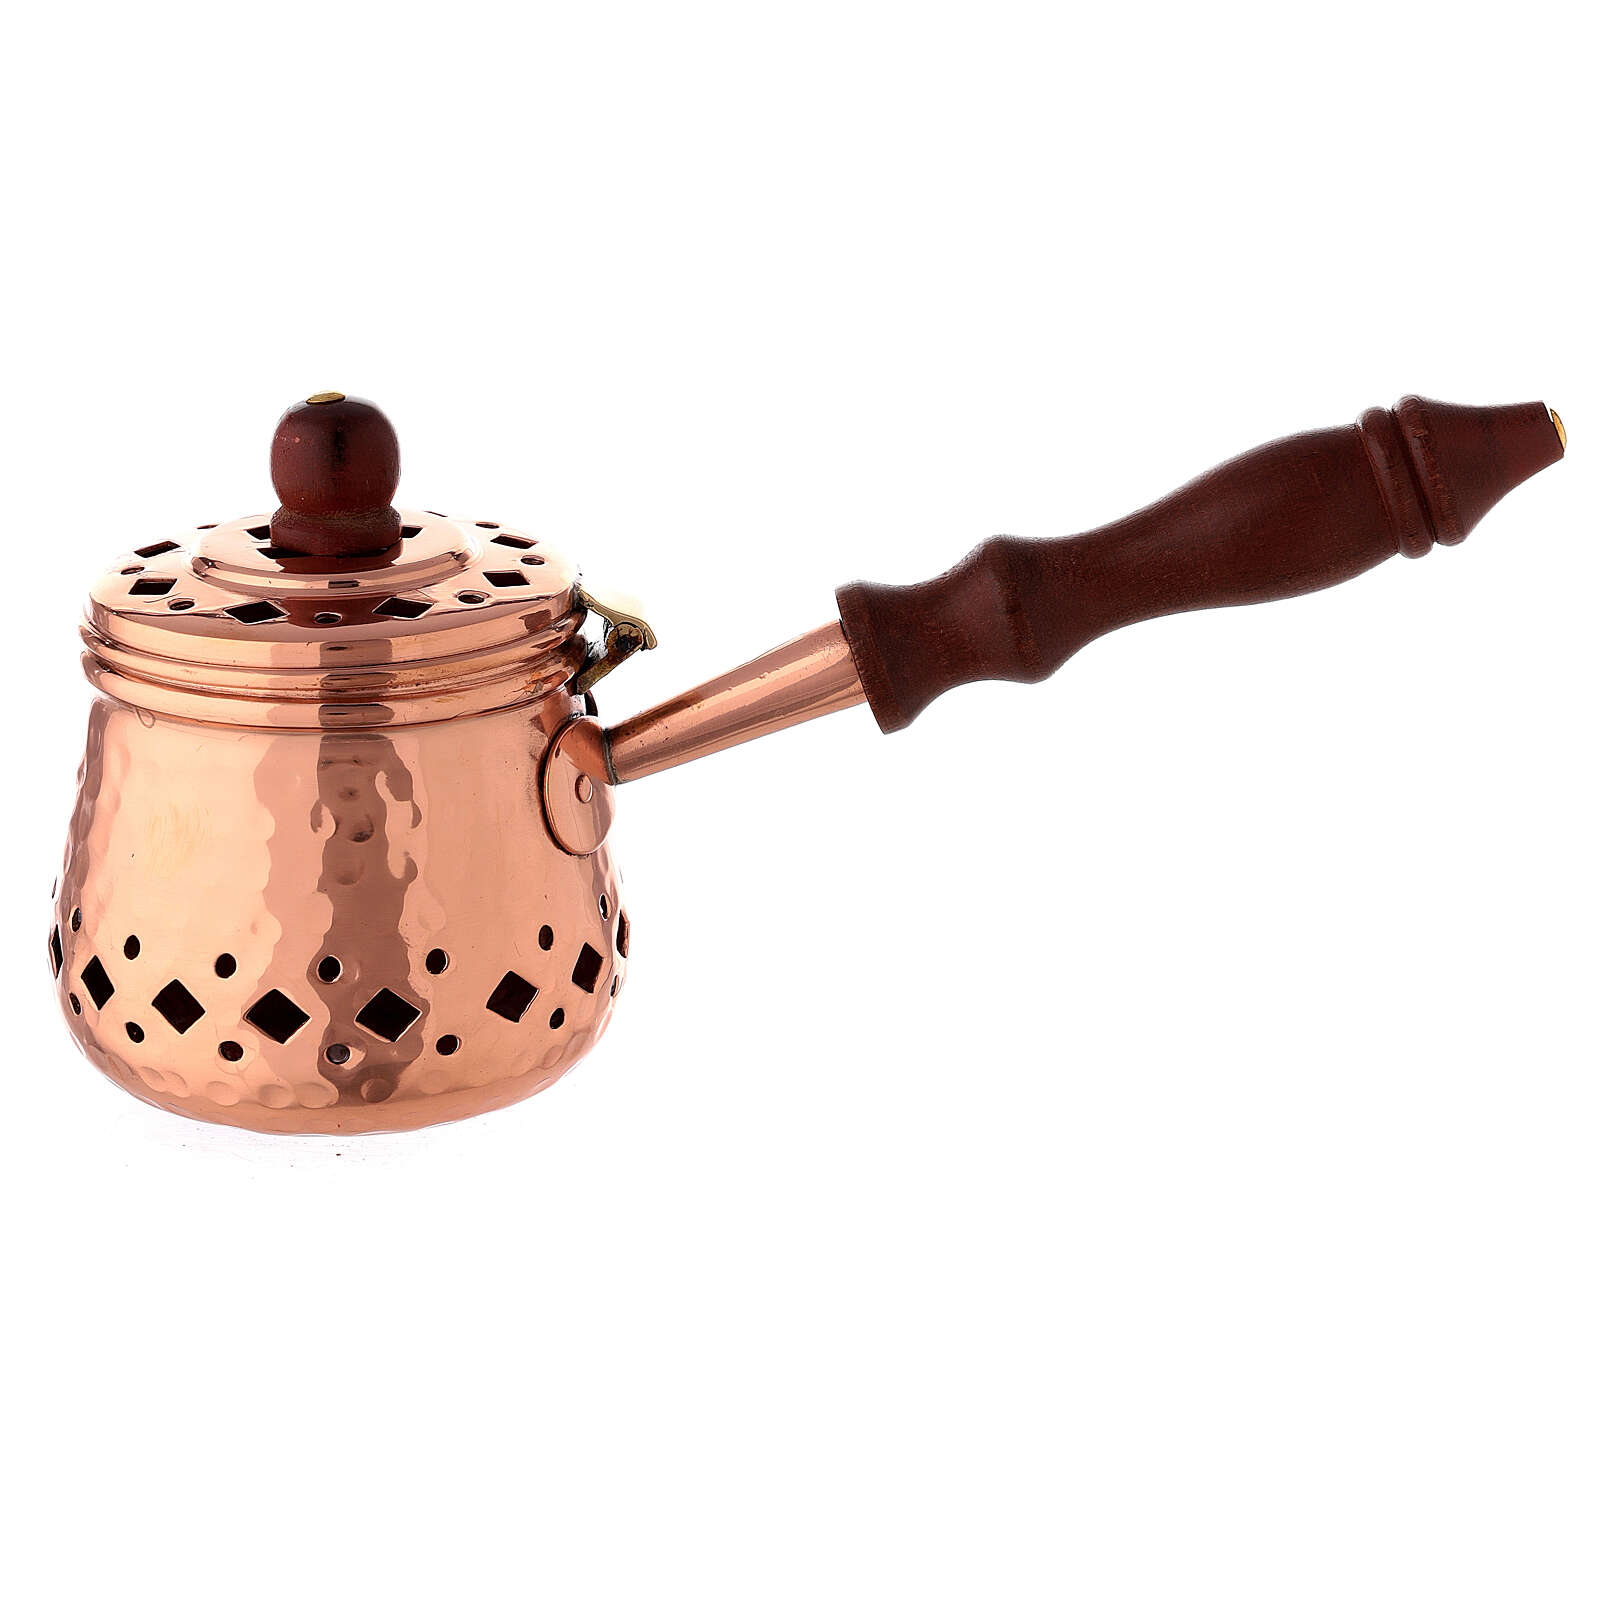 Hammered copper incense burner with wood handle 3